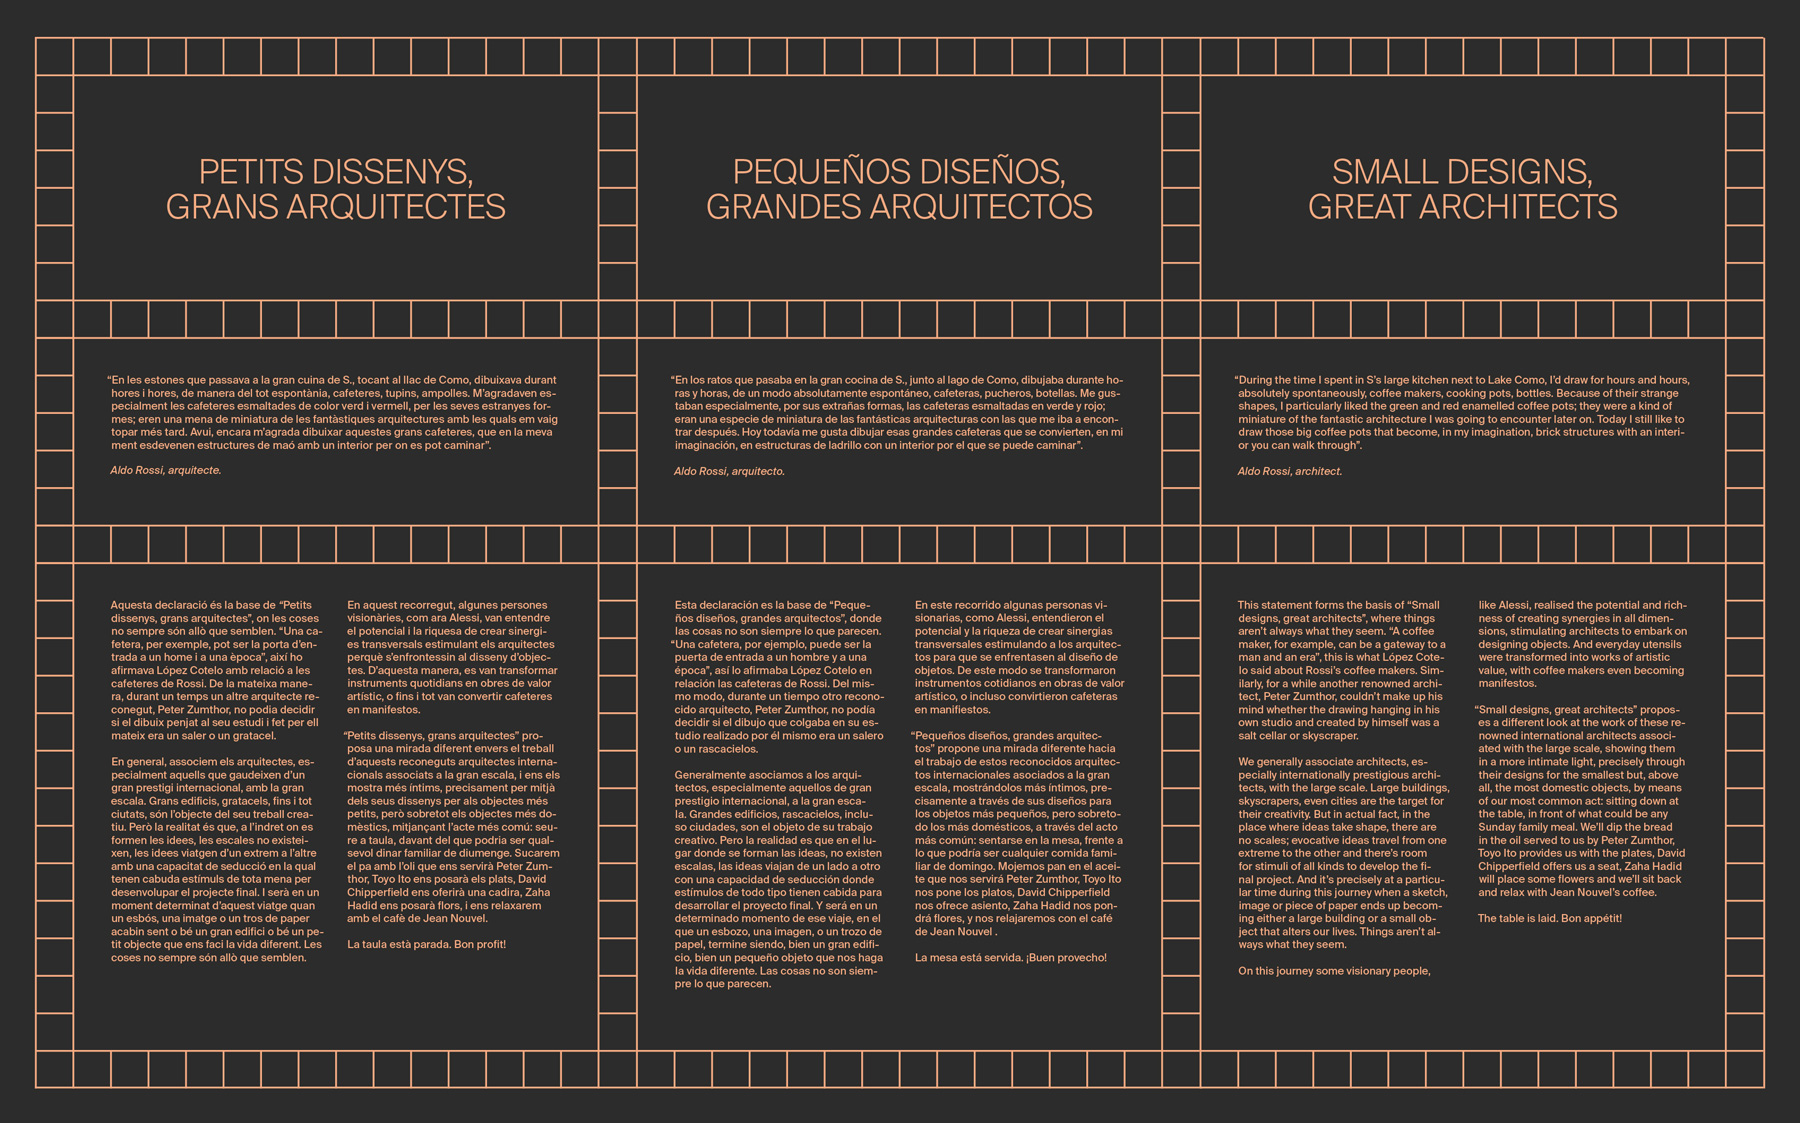 TPN—BCN, HH Small Designs Big Architects